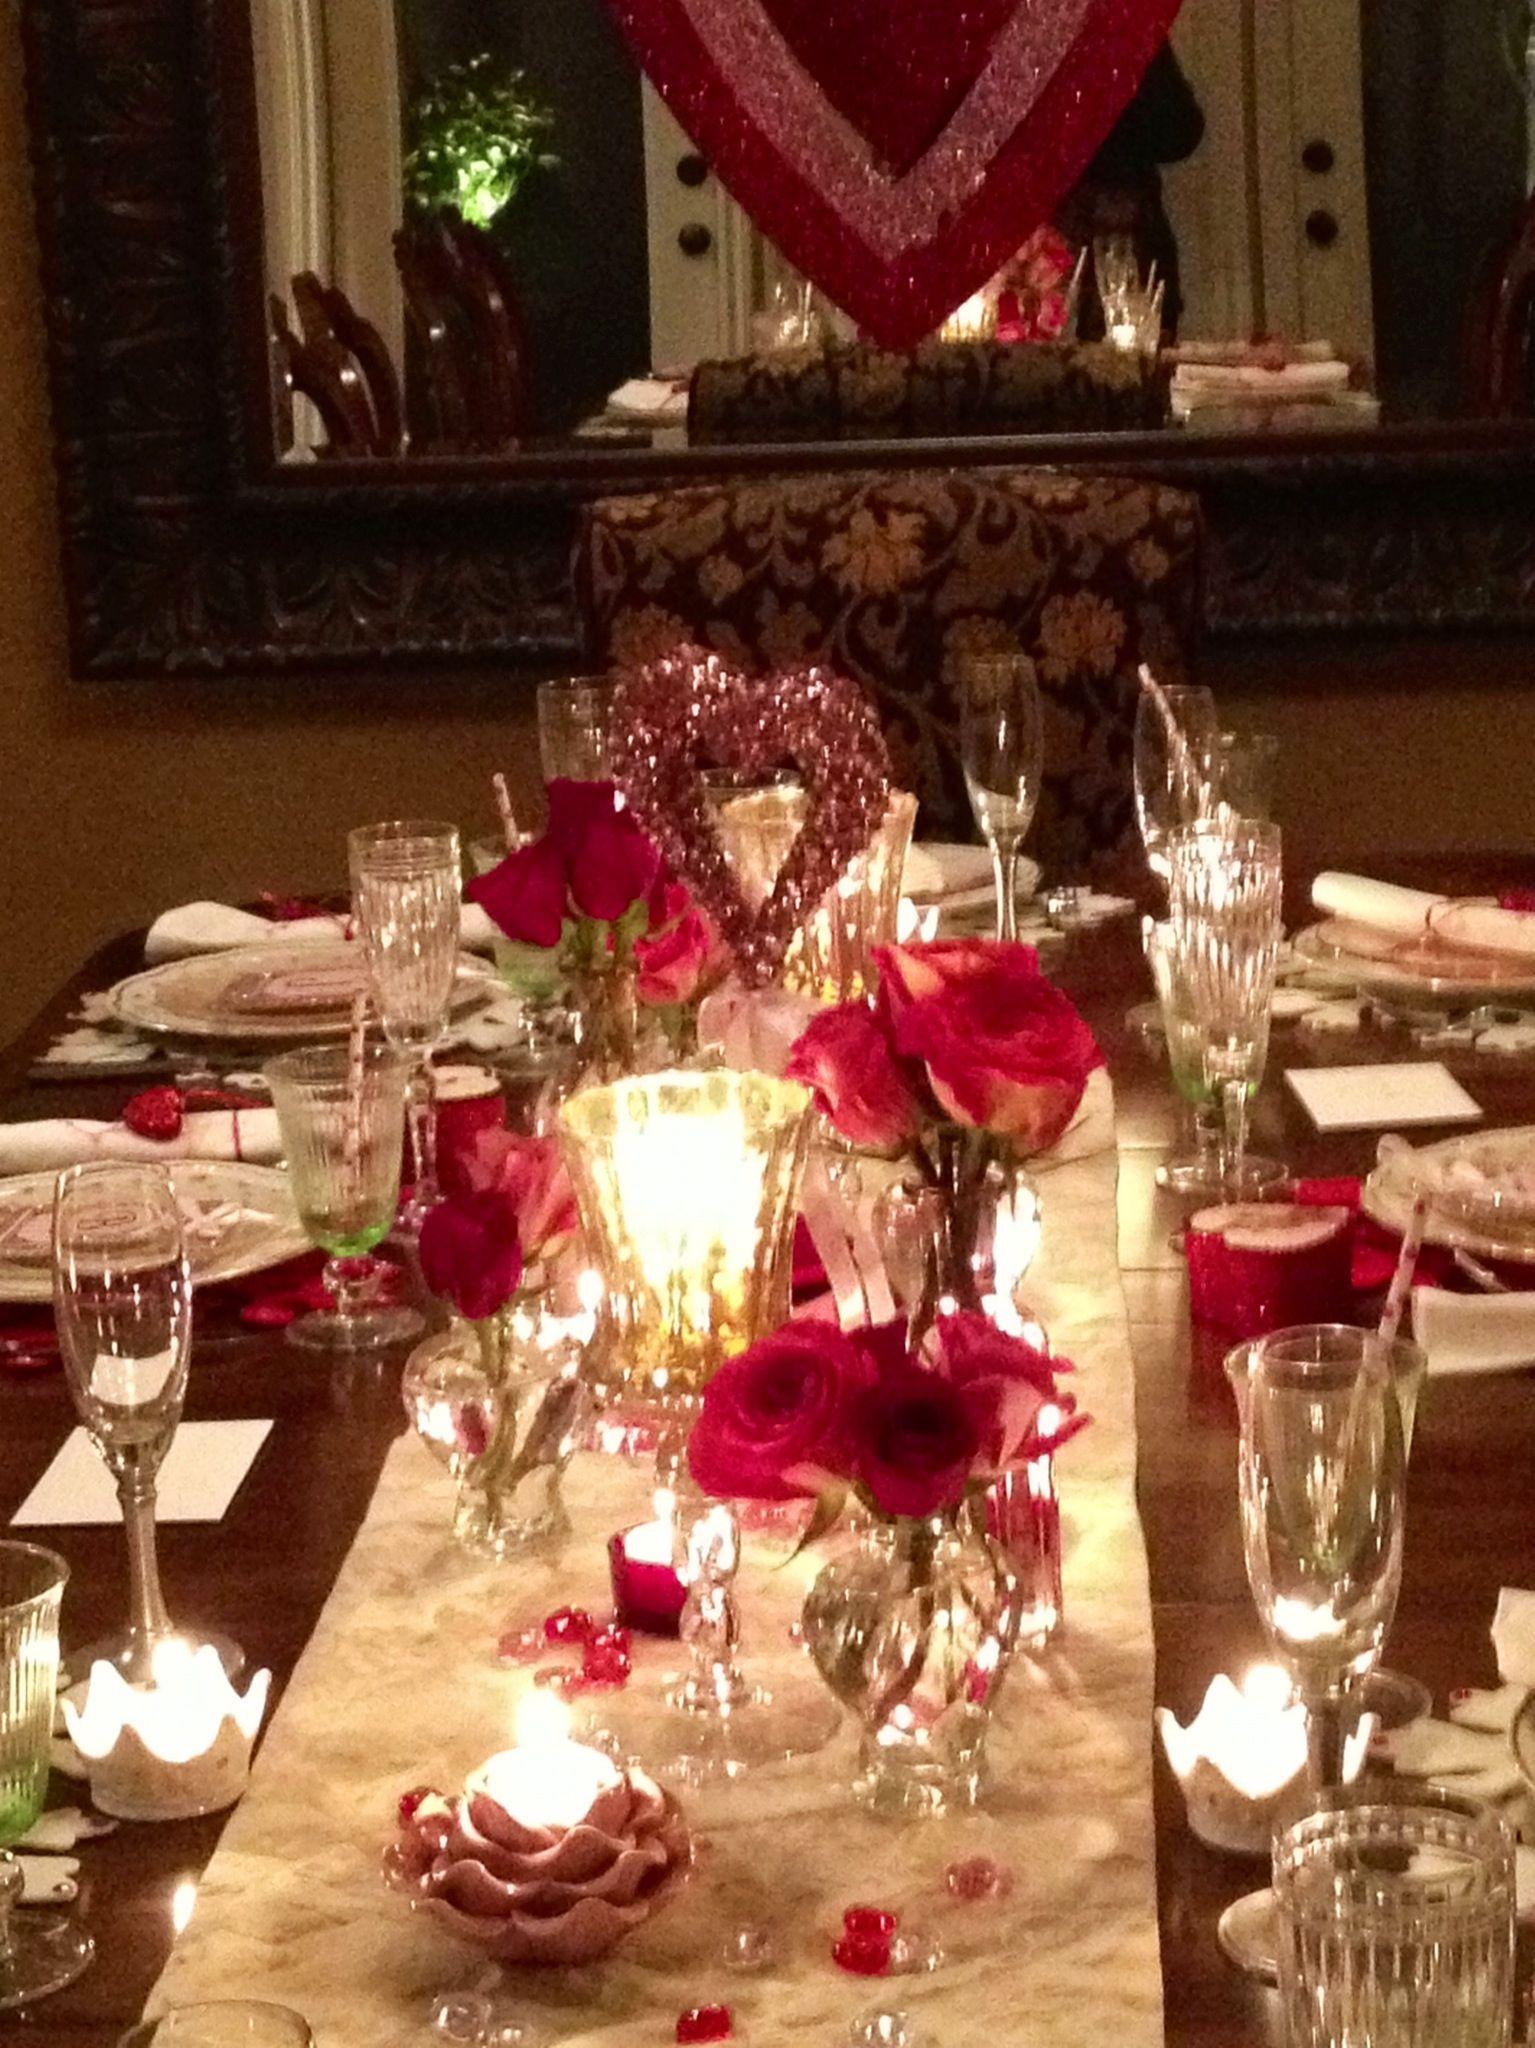 Valentines Dinner Valentine Day Table Decorations Romantic Table Decor Valentines Day Dinner